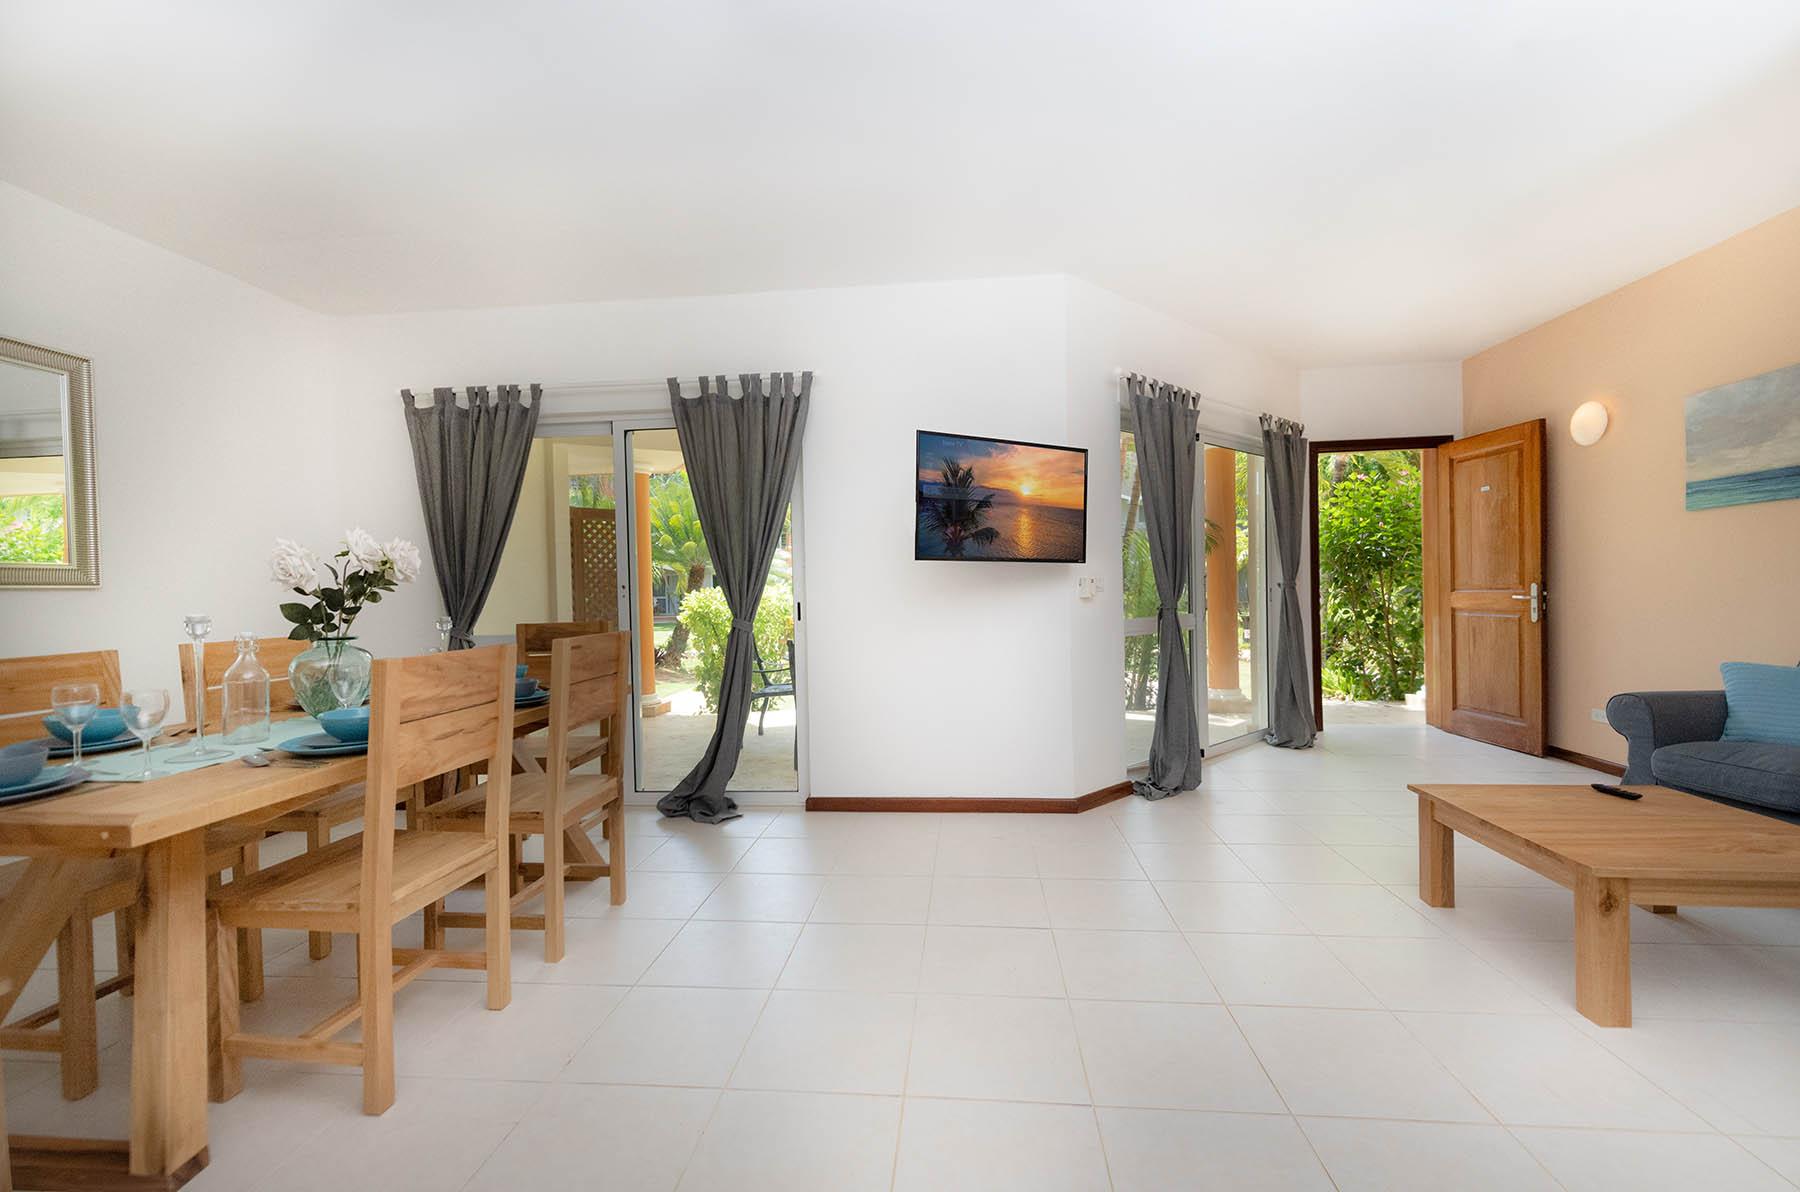 duplex-living-room-2